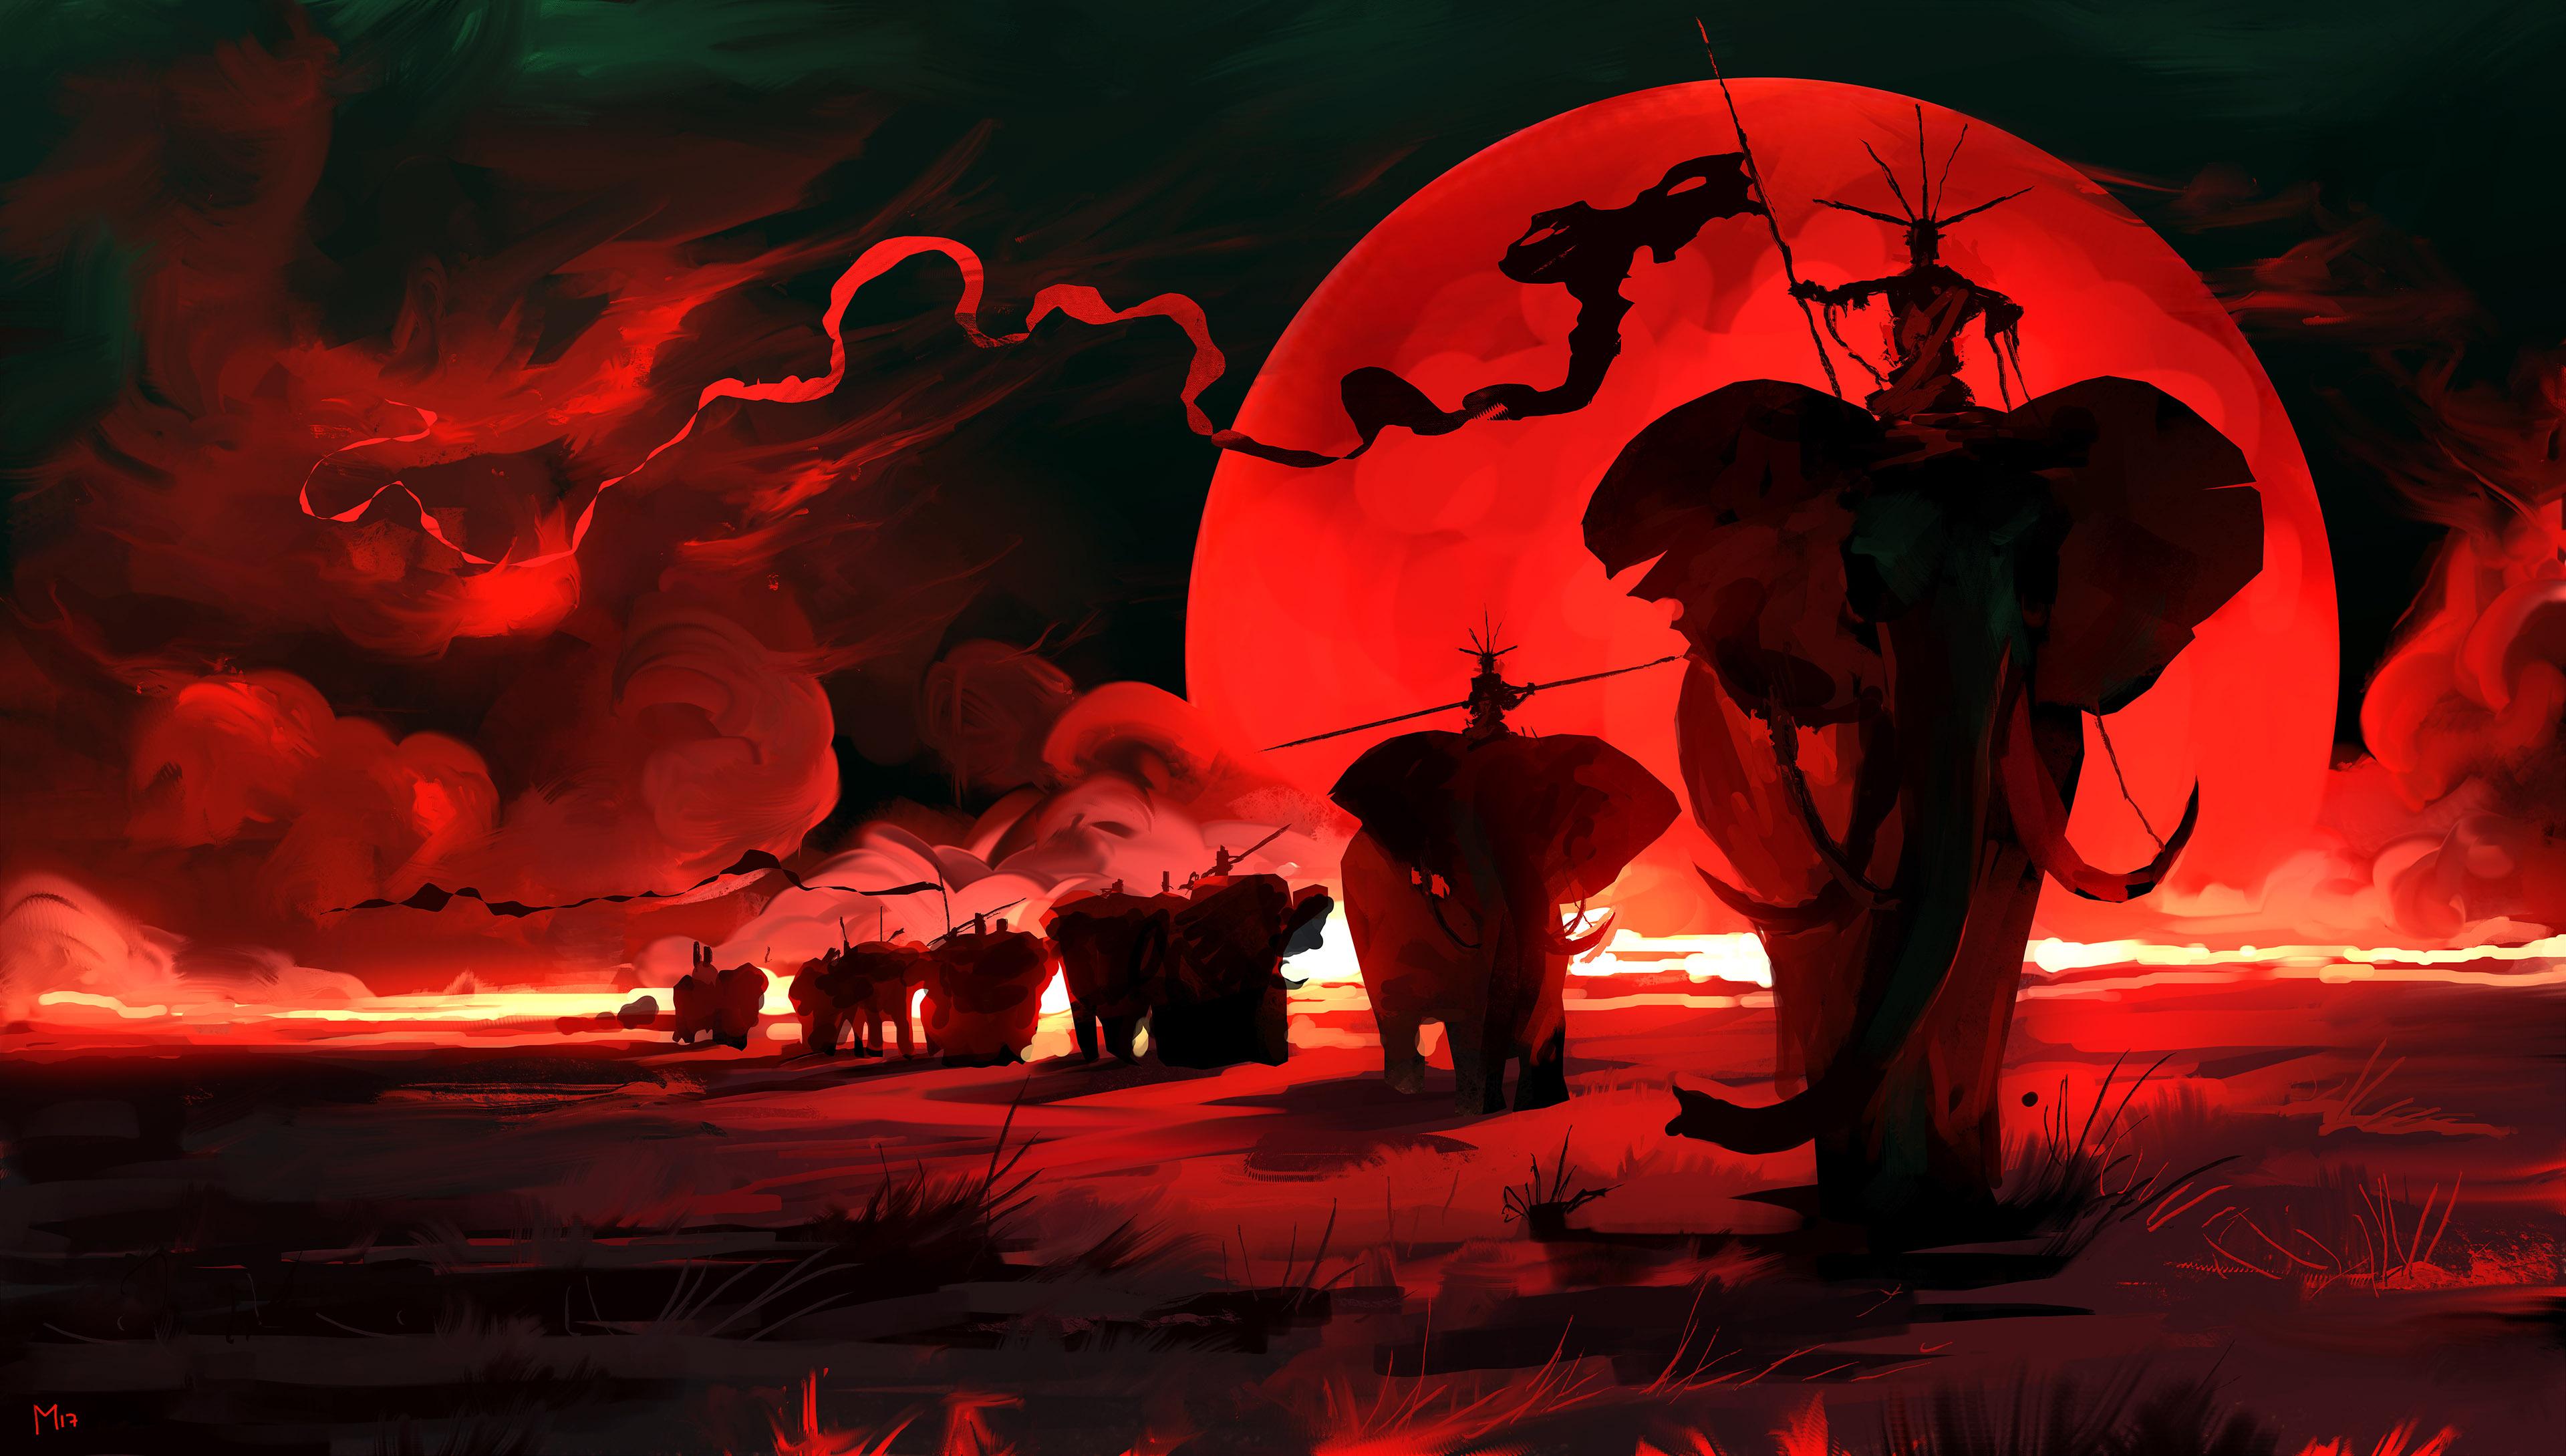 General 3840x2179 red moon elephant Dominik Mayer painting digital art artwork red